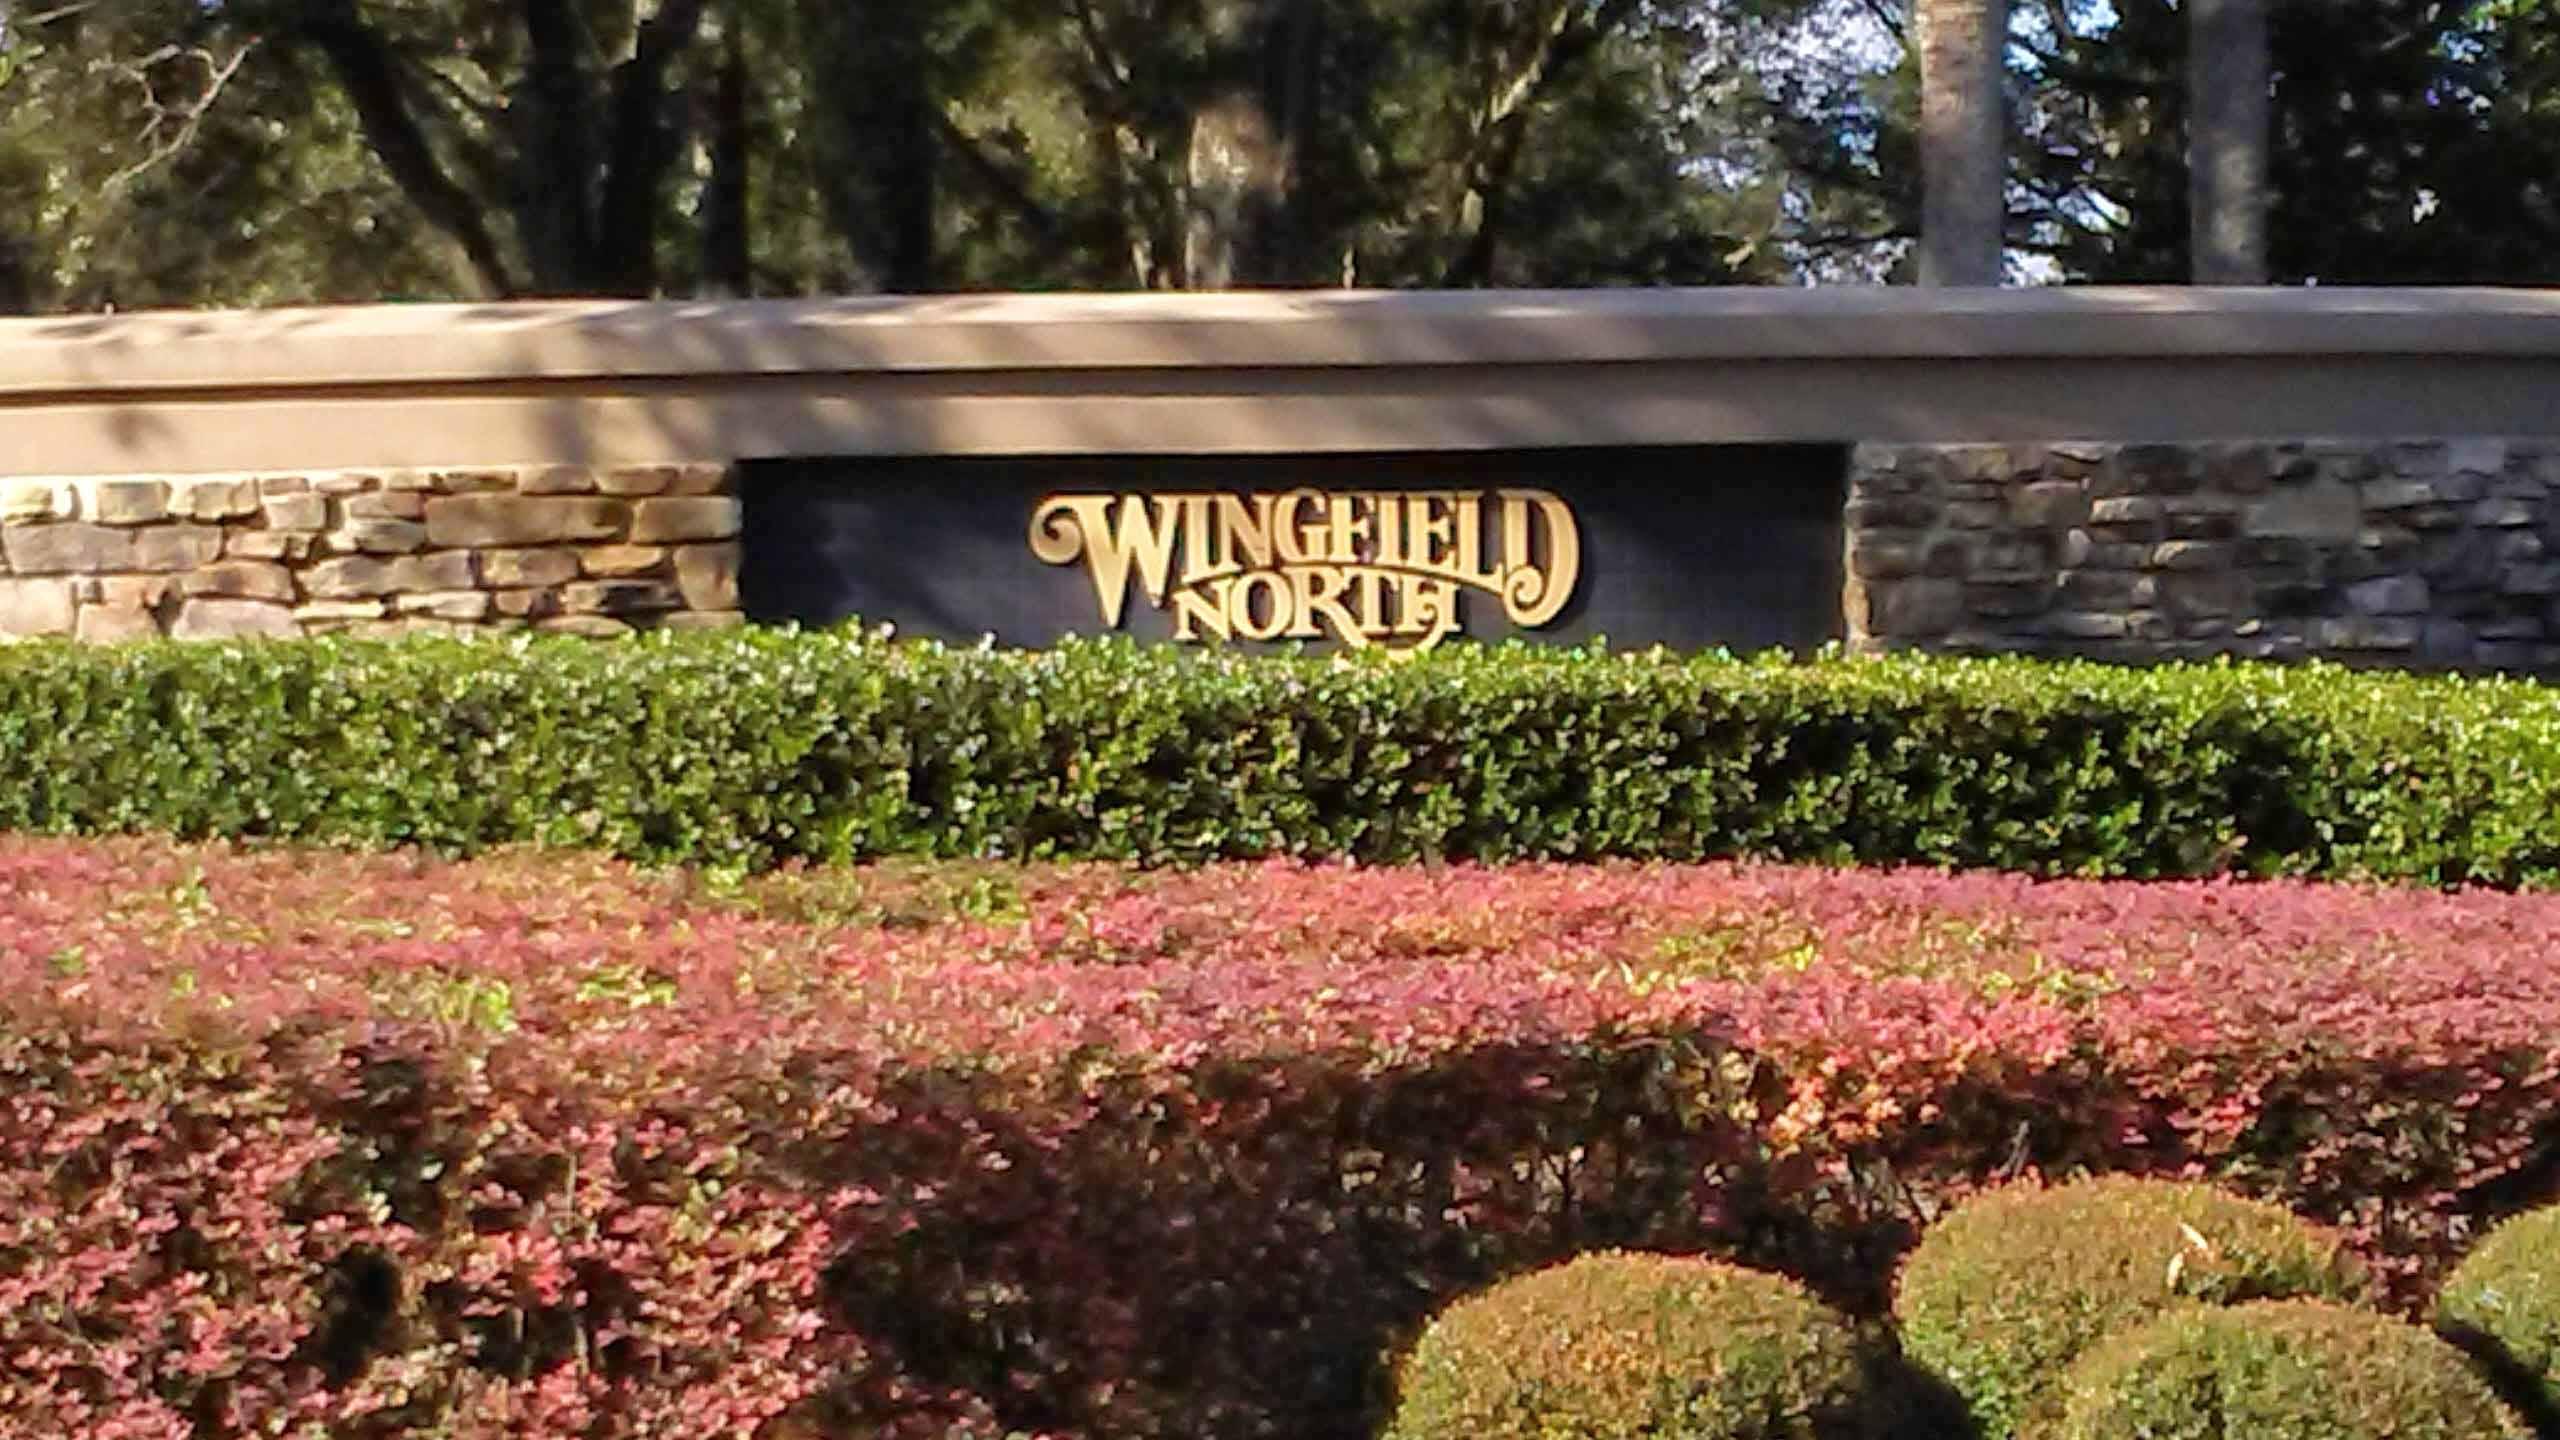 Wingfield North, Longwood, Florida 32779